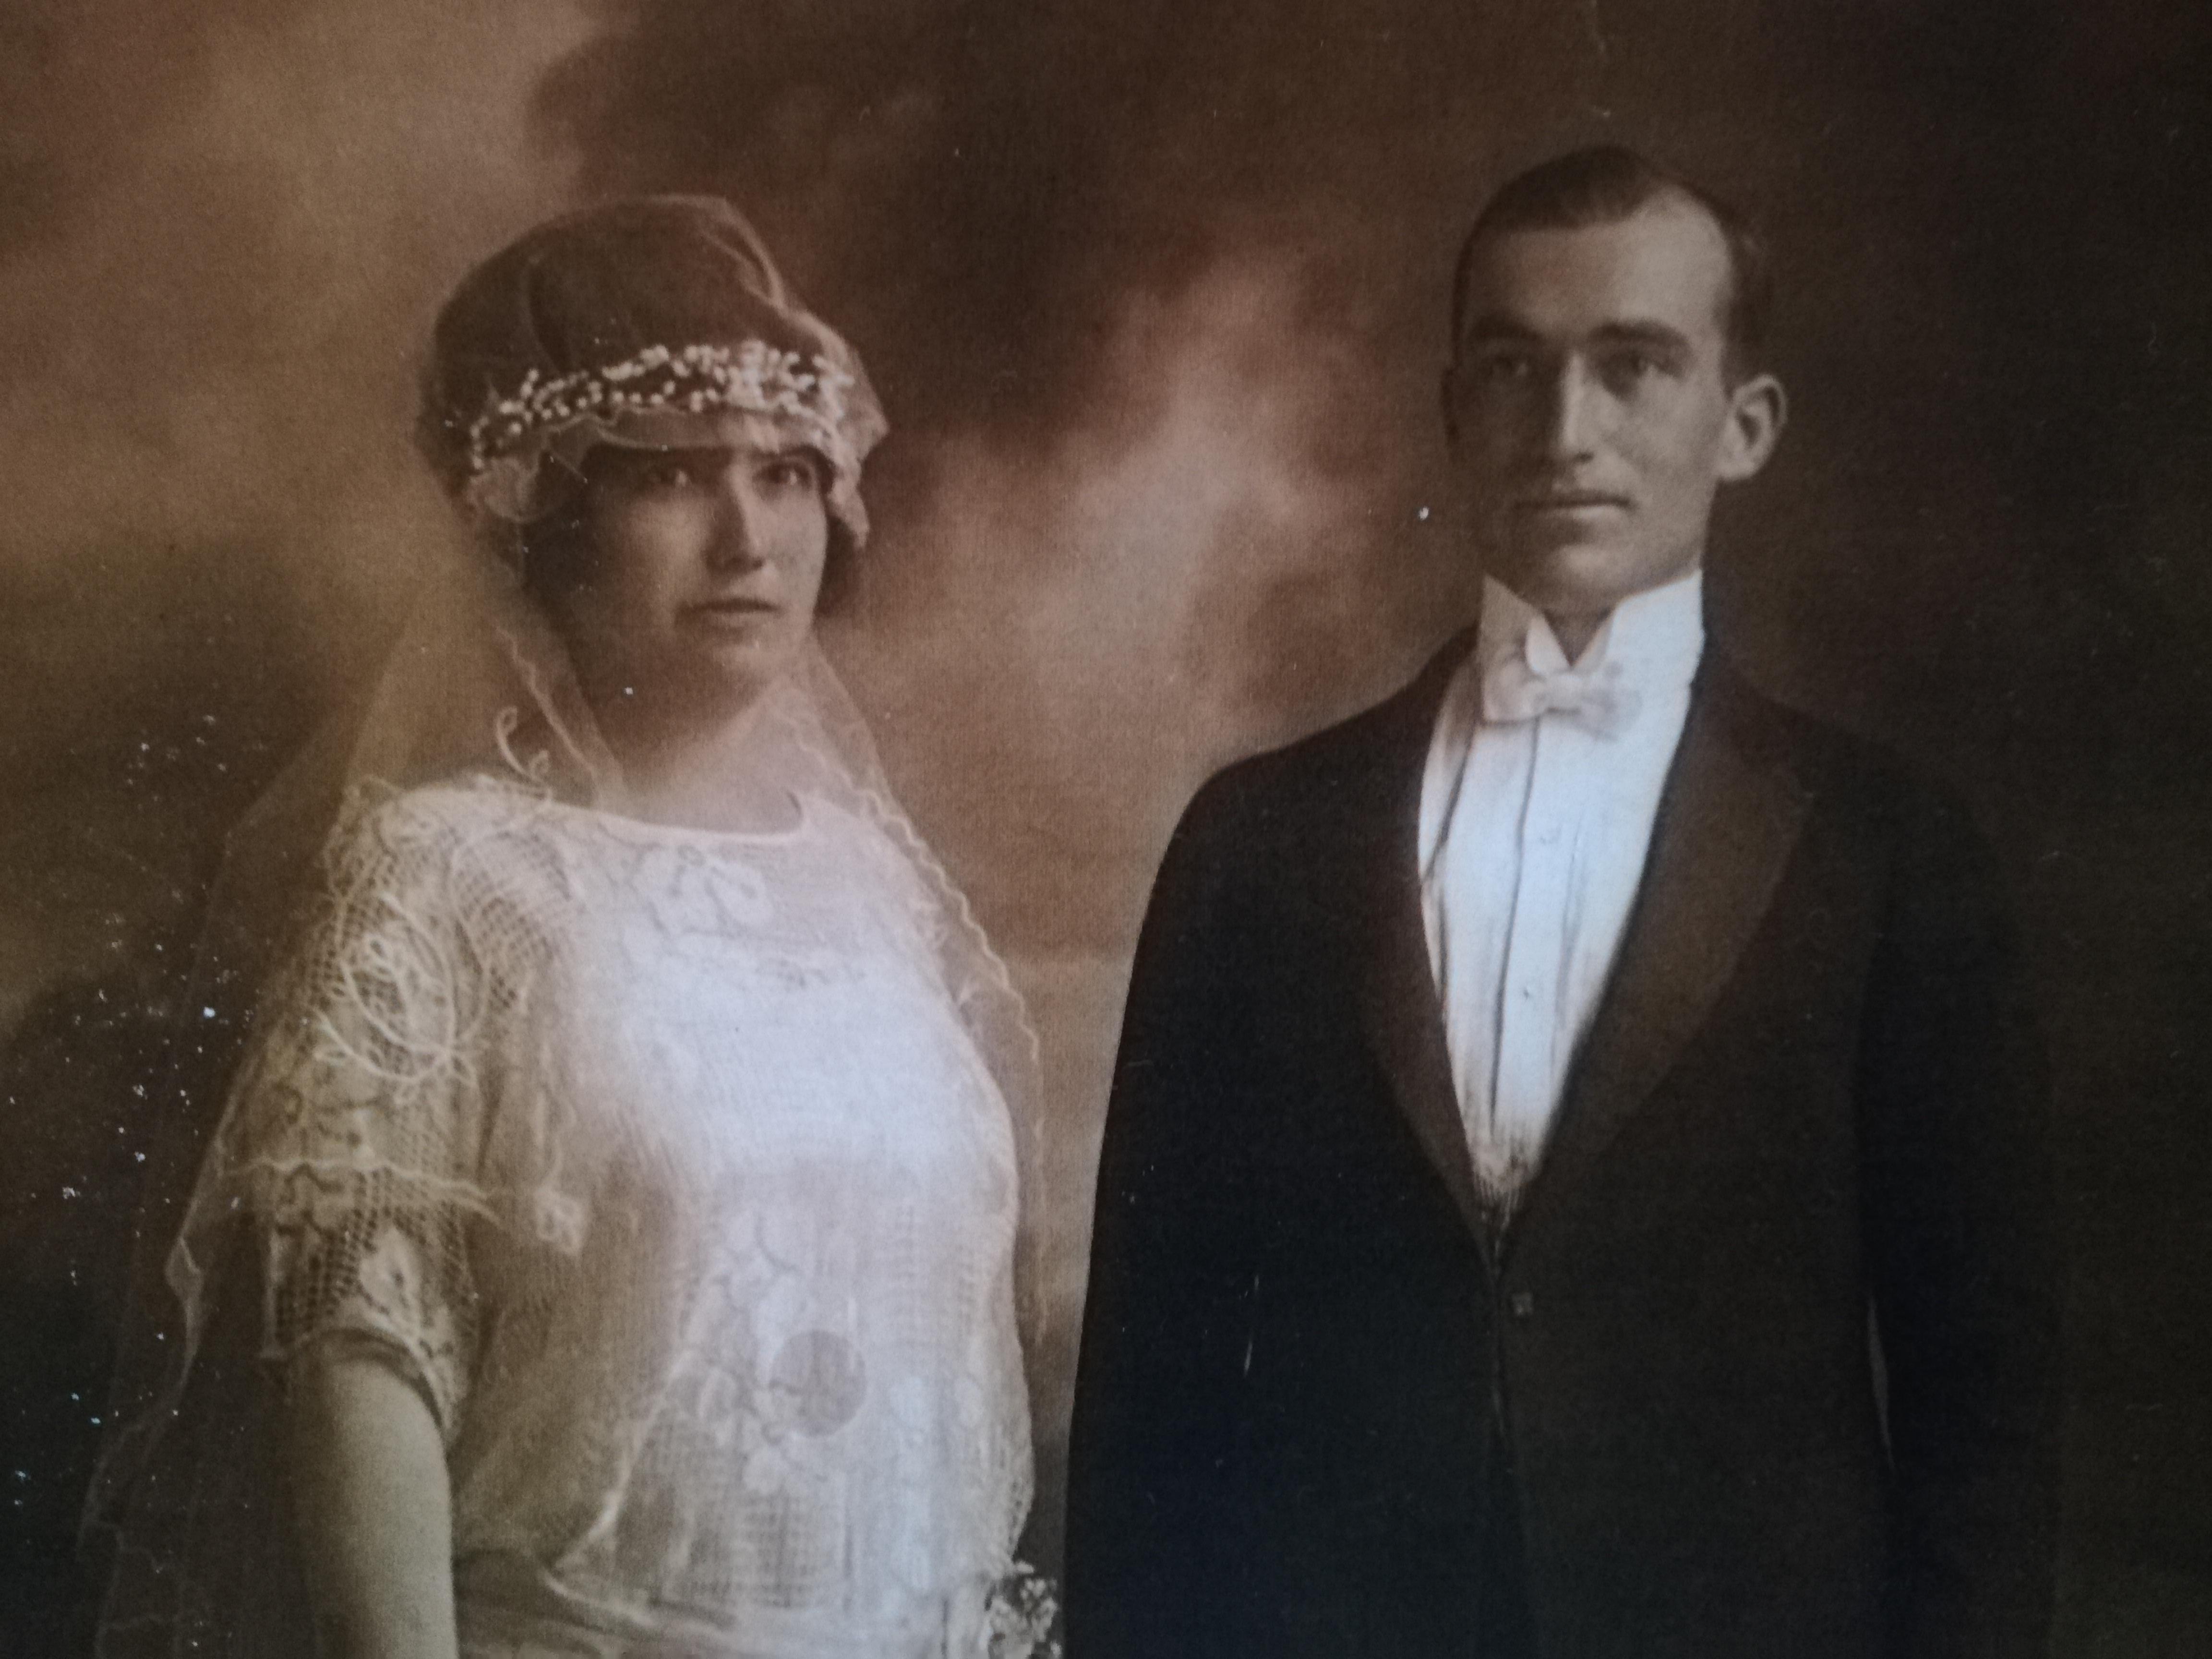 Graciano Arribí Piñón y Carmen Veiga Varela boda Nueva York 1920 (1).jpg